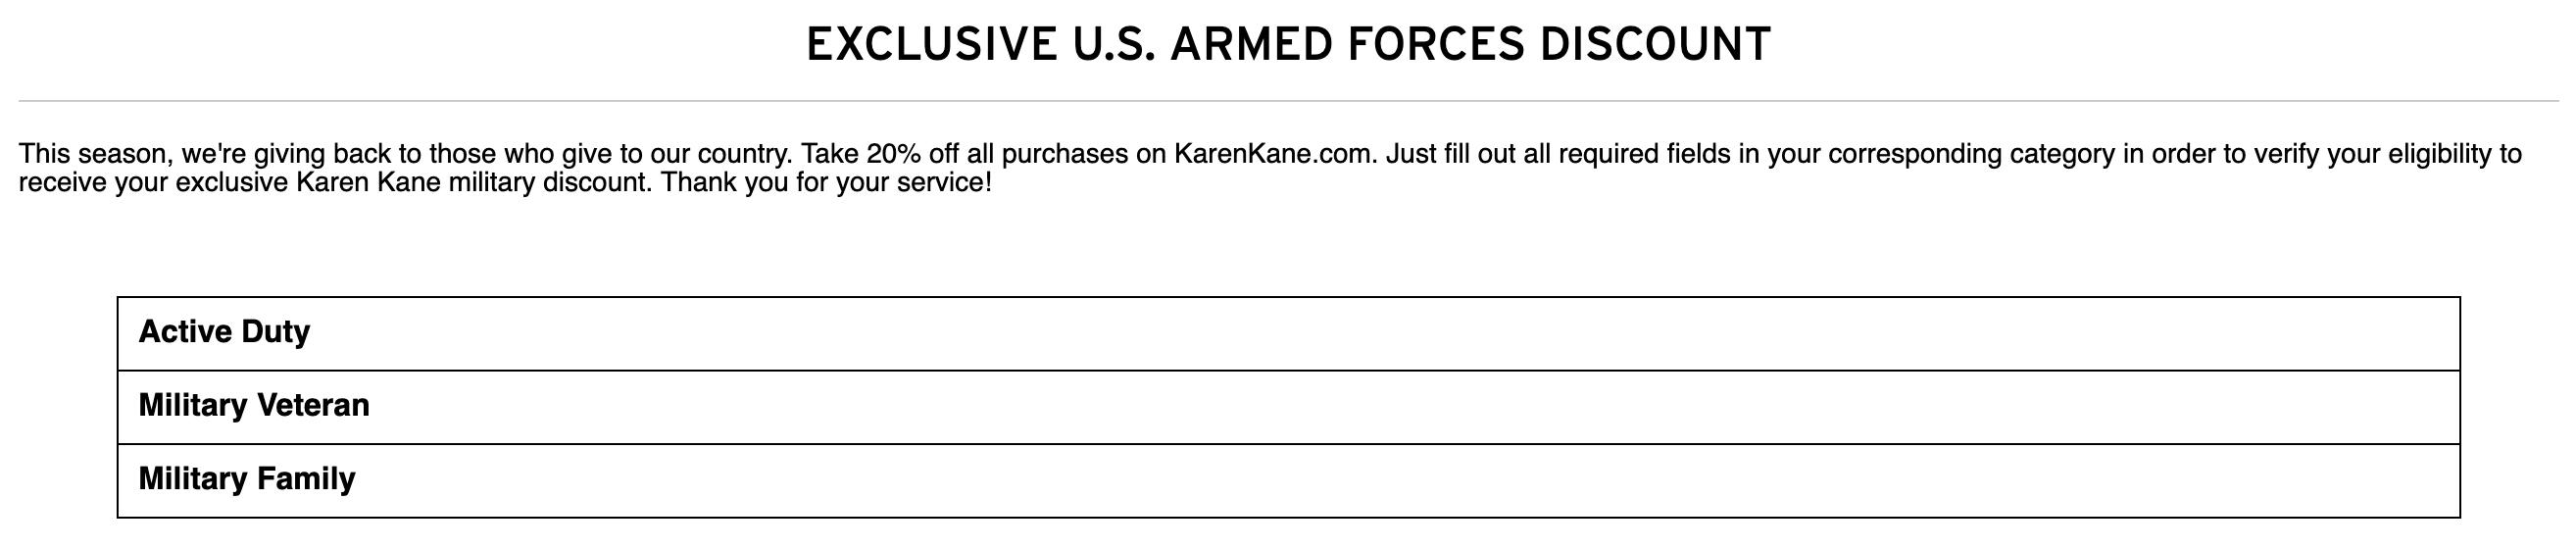 Karen Kane Military Veteran Discounts